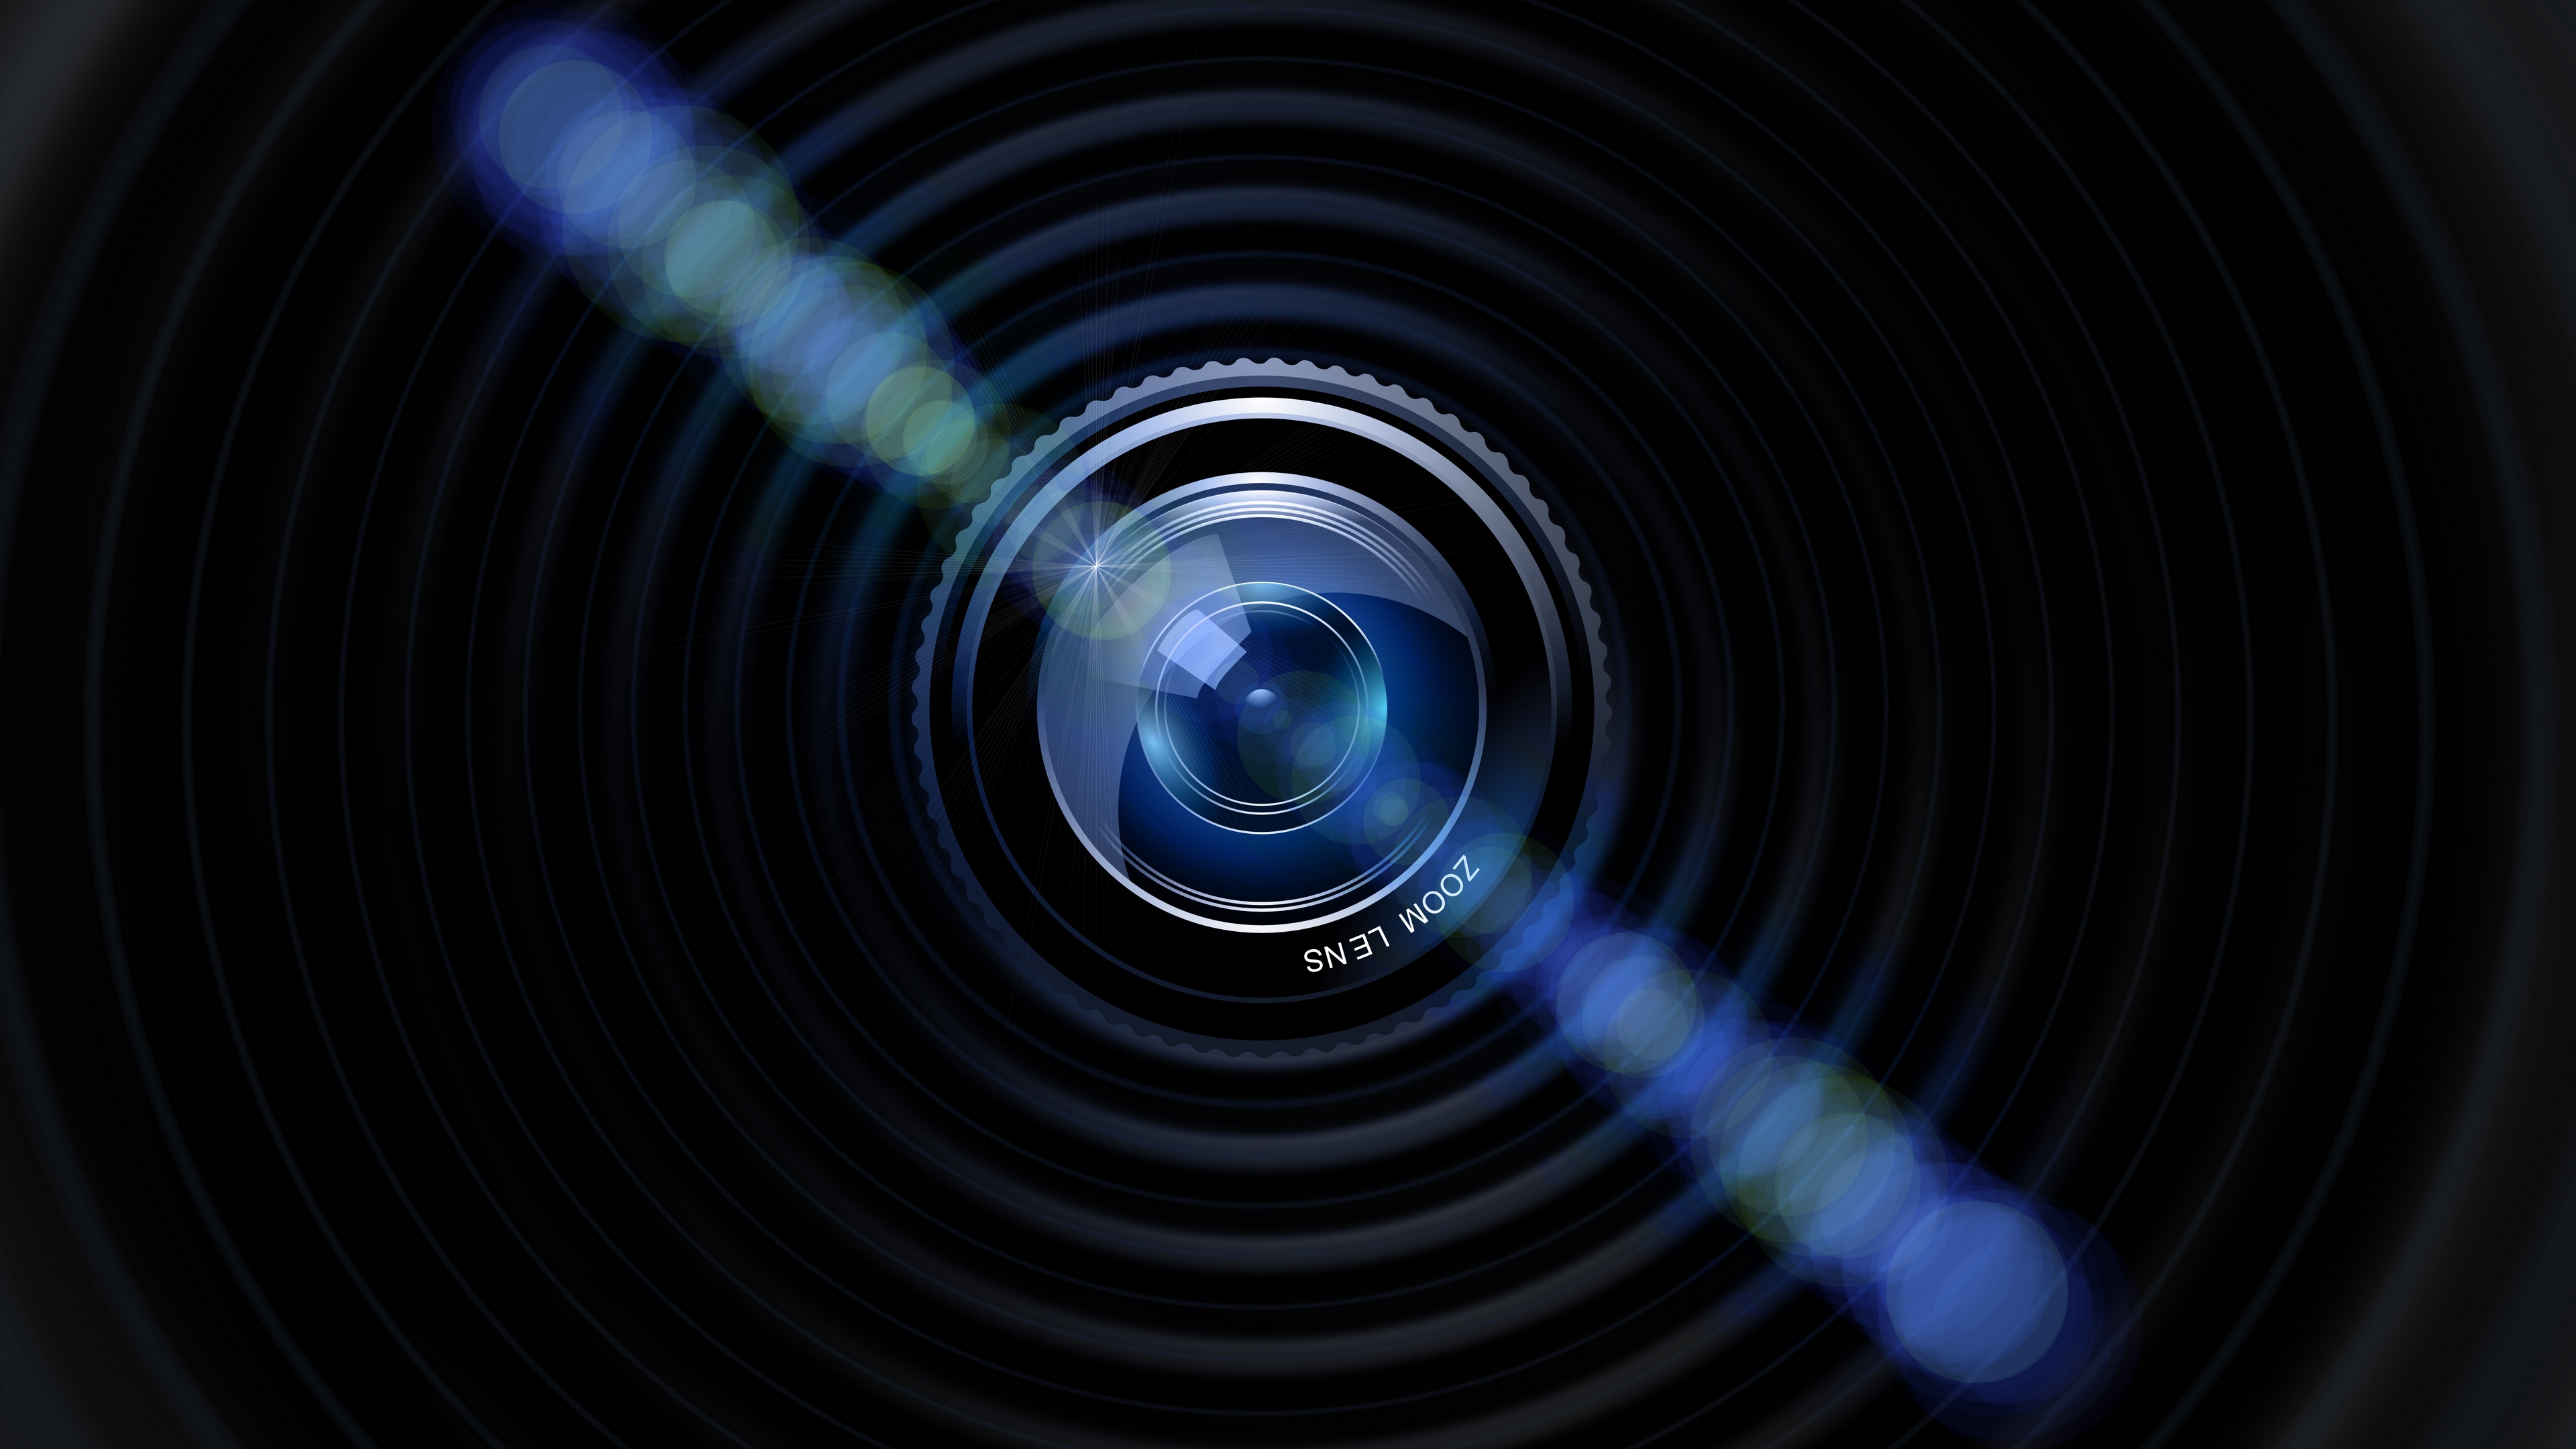 lens camera bokeh glare 4k 1540575522 - lens, camera, bokeh, glare 4k - lens, camera, Bokeh